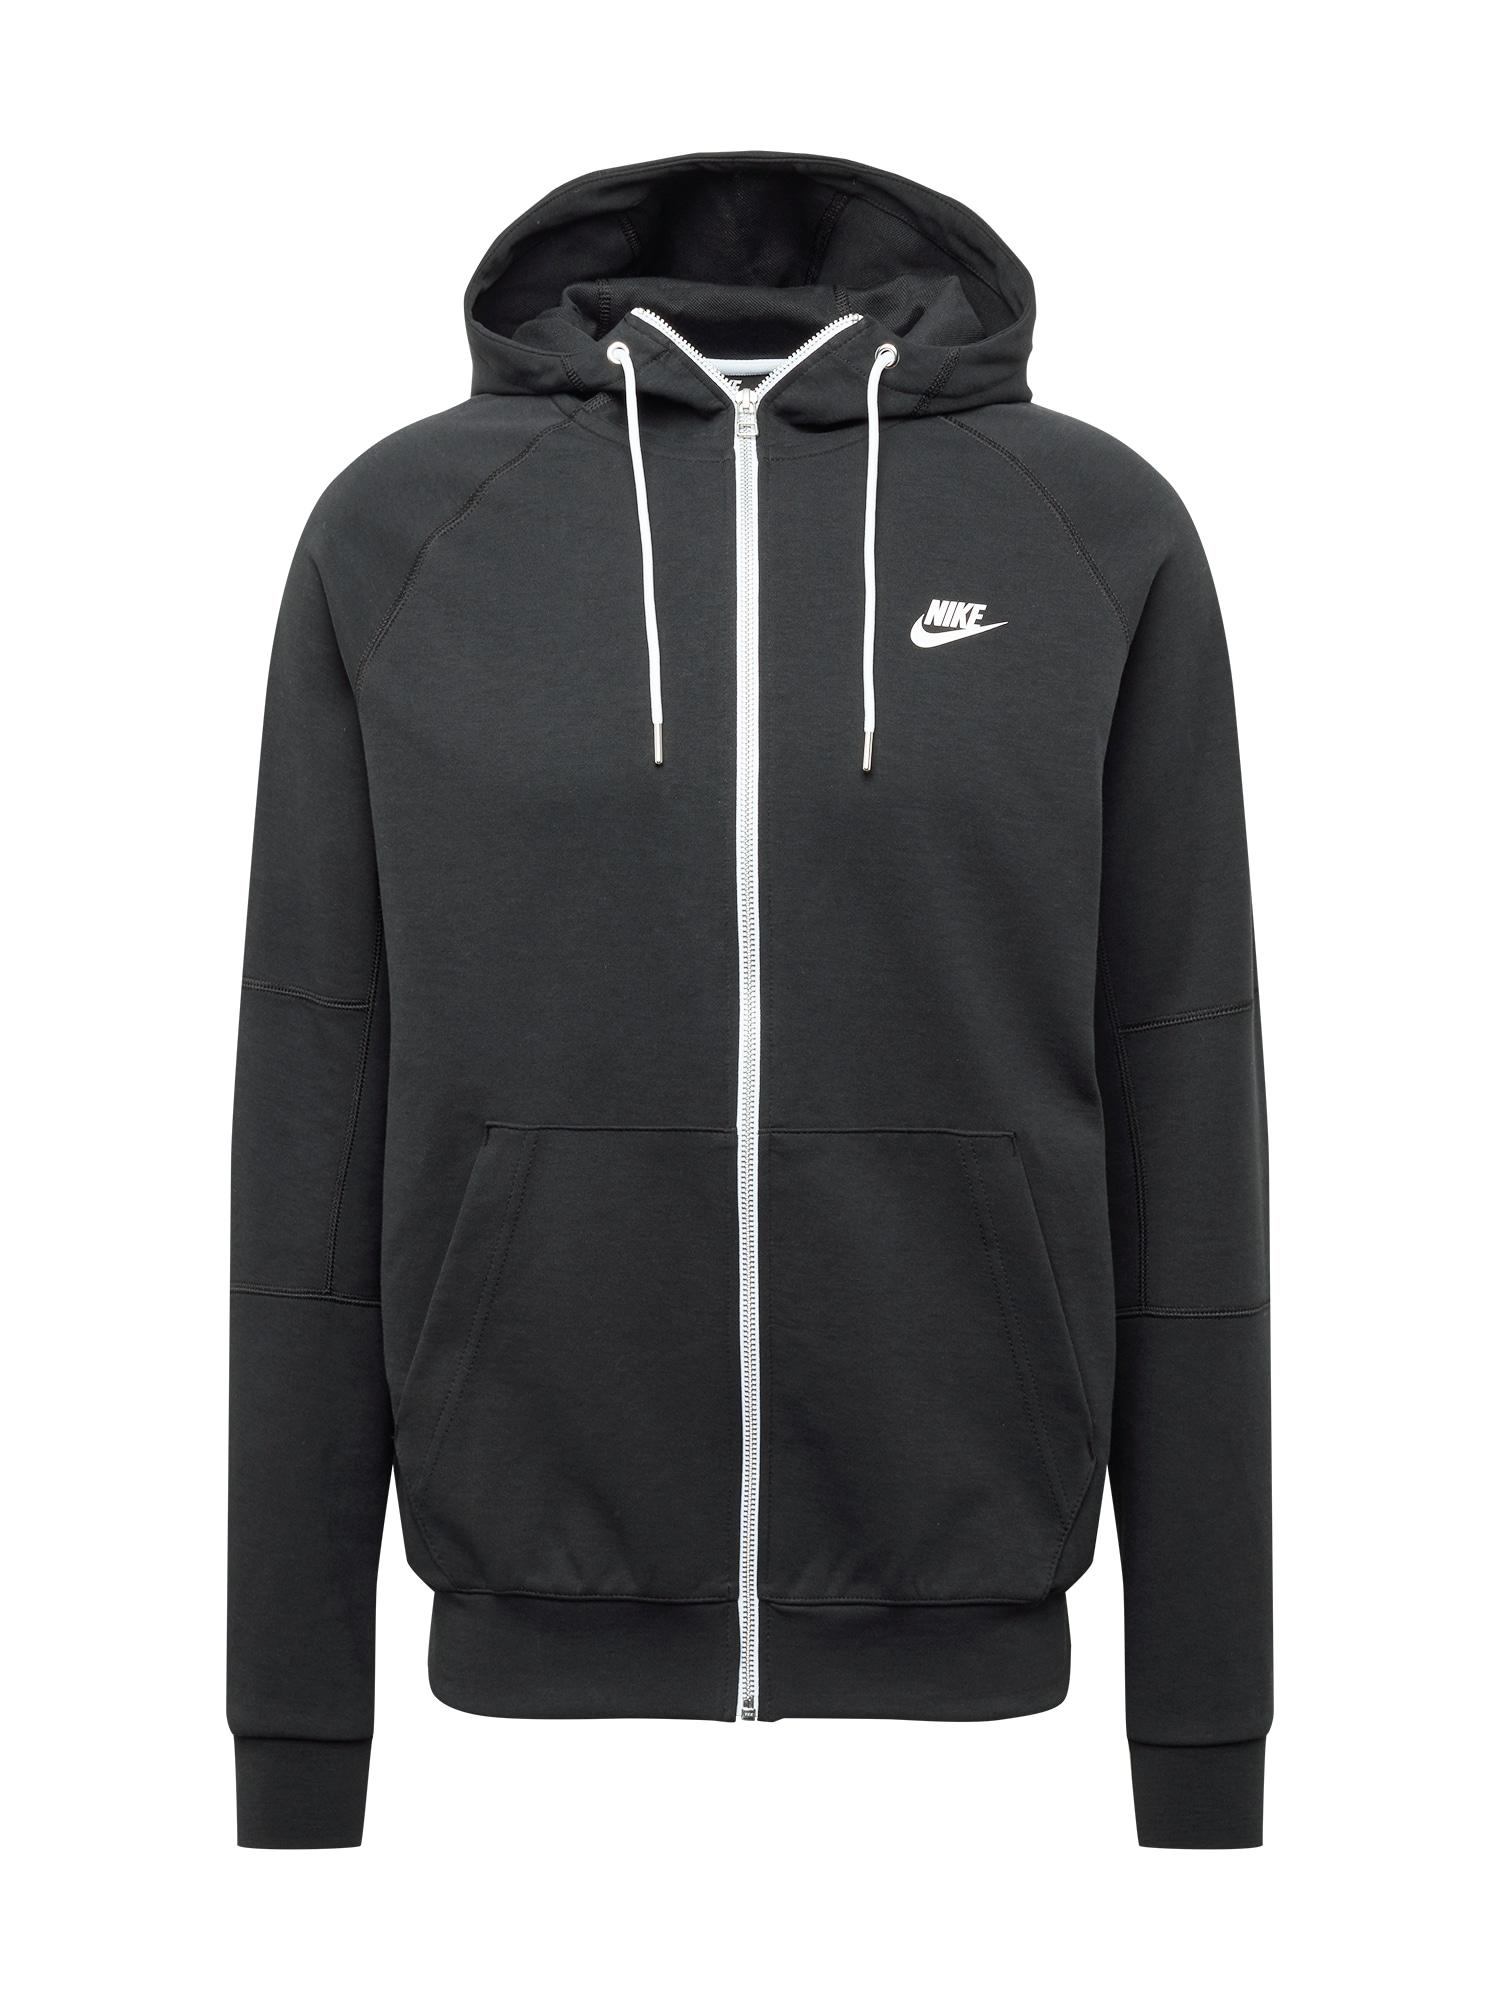 Nike Sportswear Džemperis juoda / balta